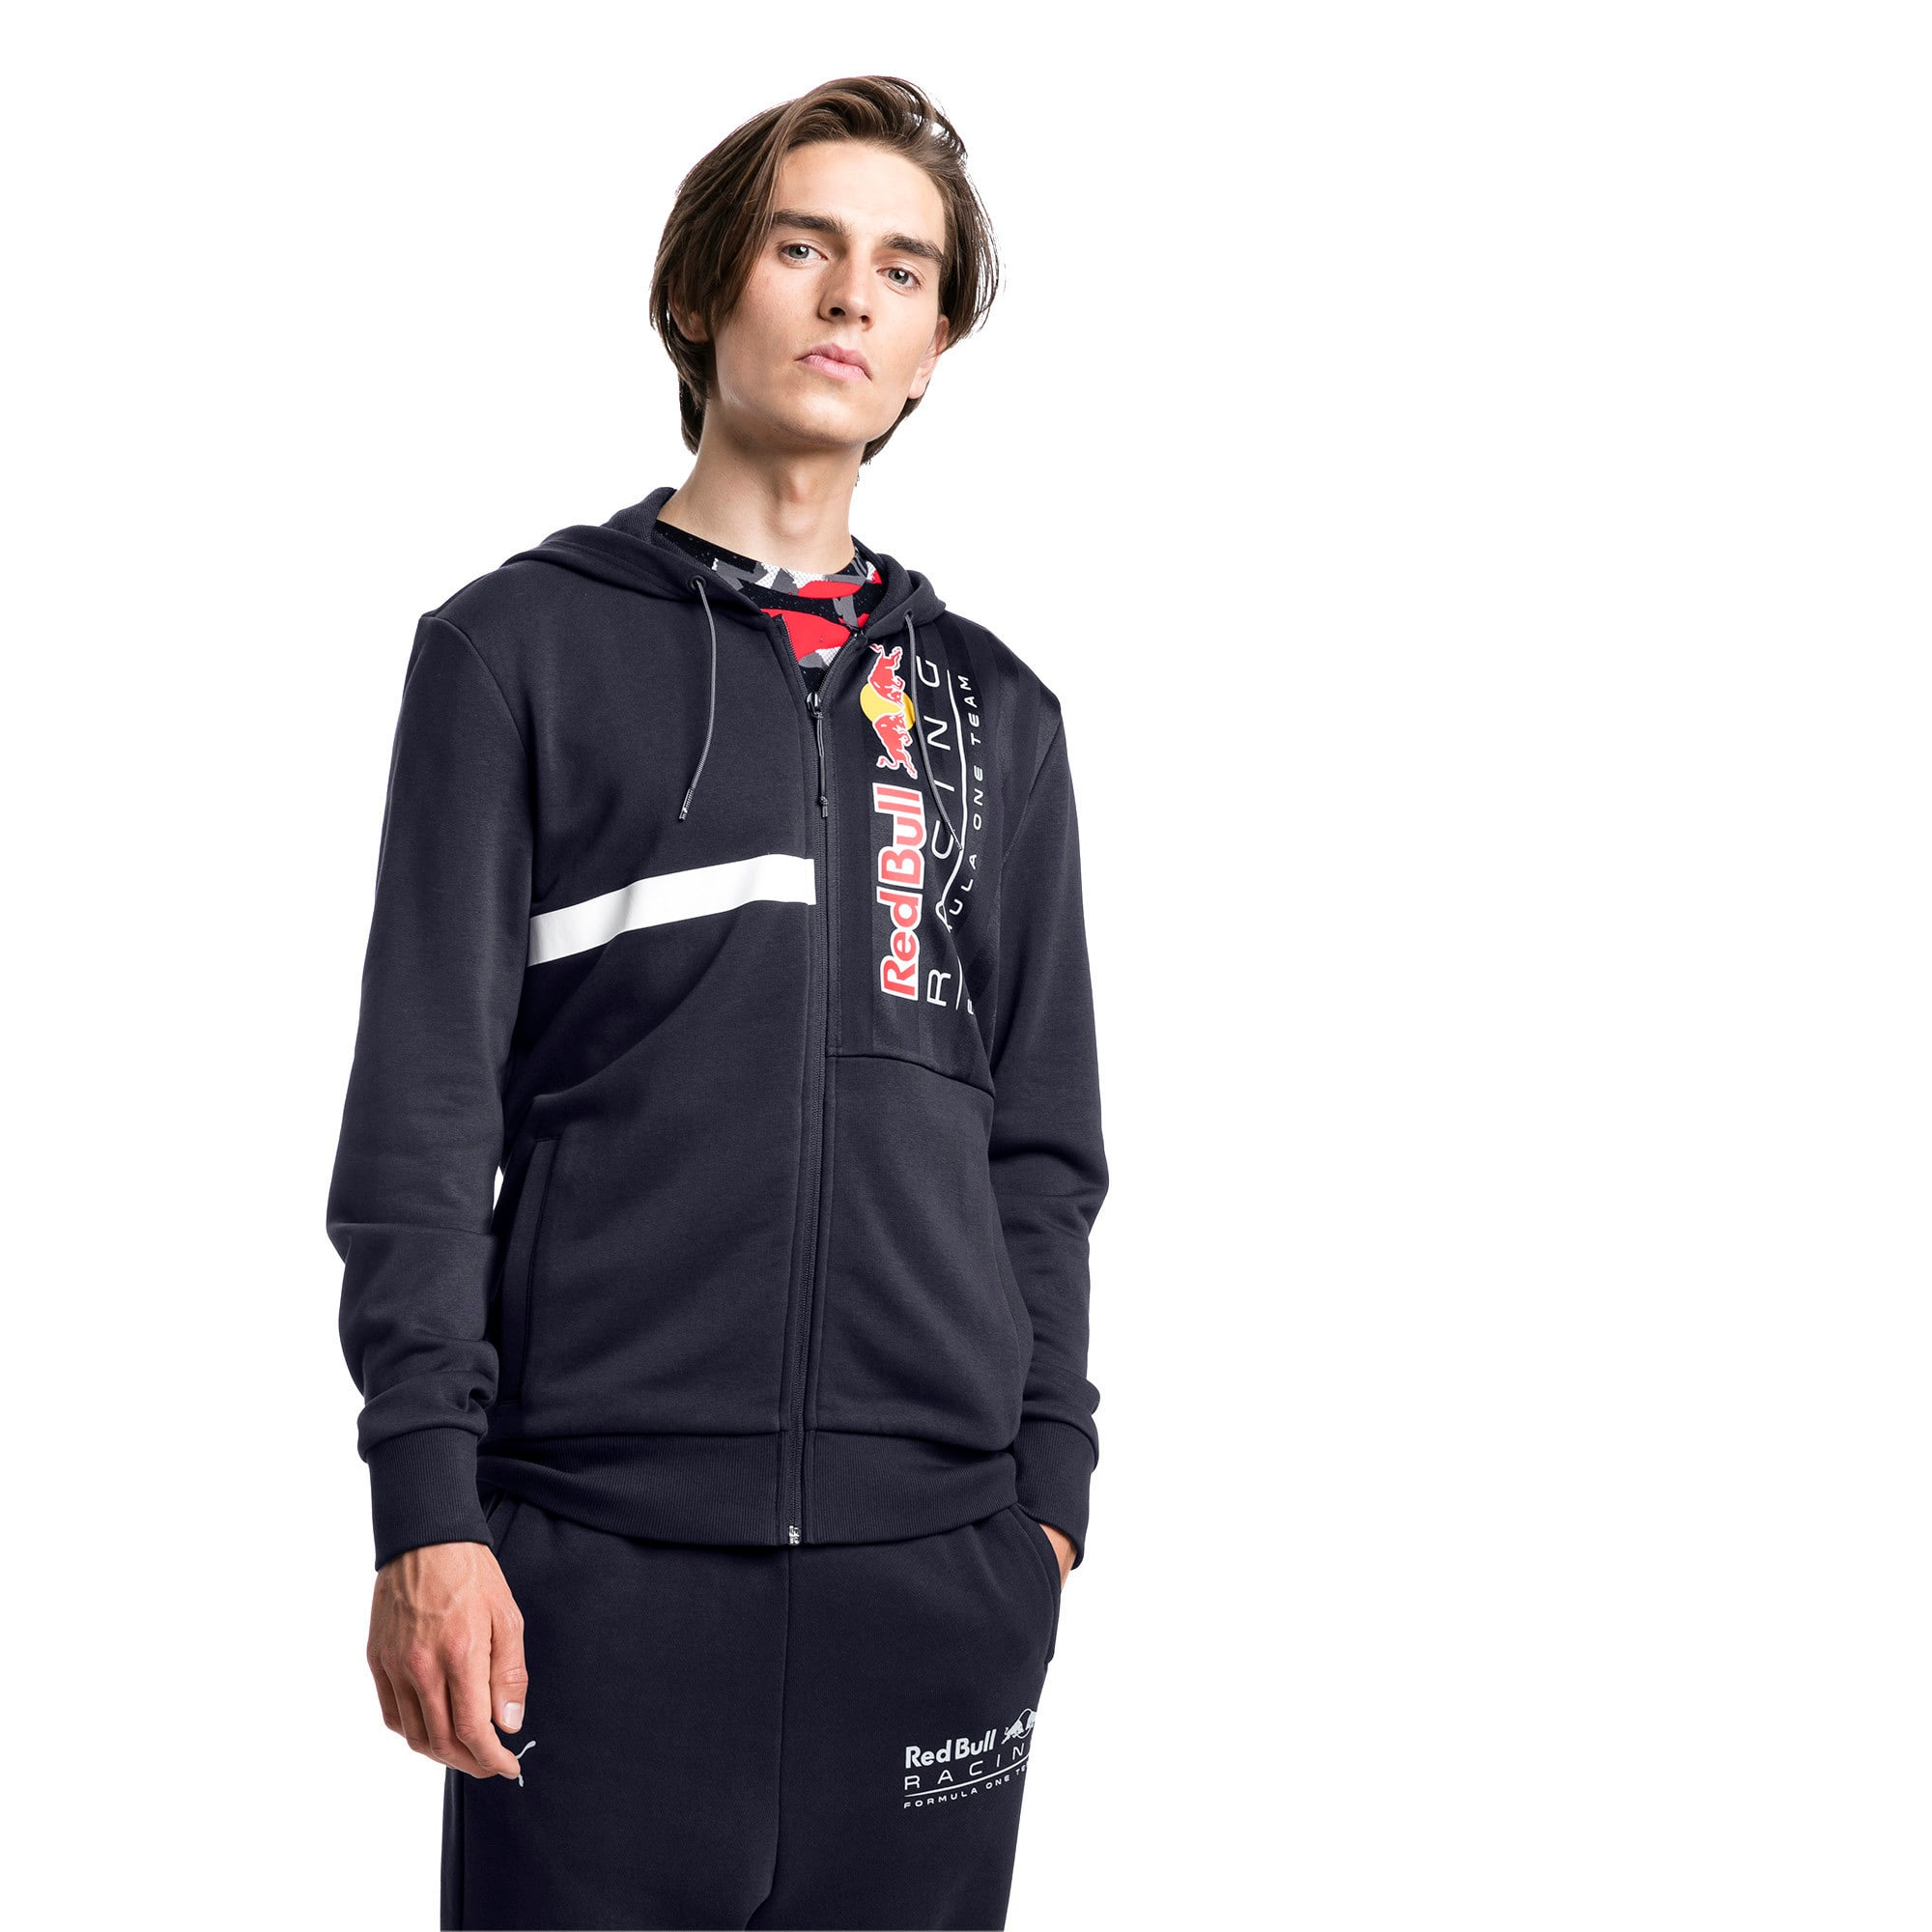 Thumbnail 1 of Red Bull Racing Logo Men's Hooded Sweat Jacket, NIGHT SKY, medium